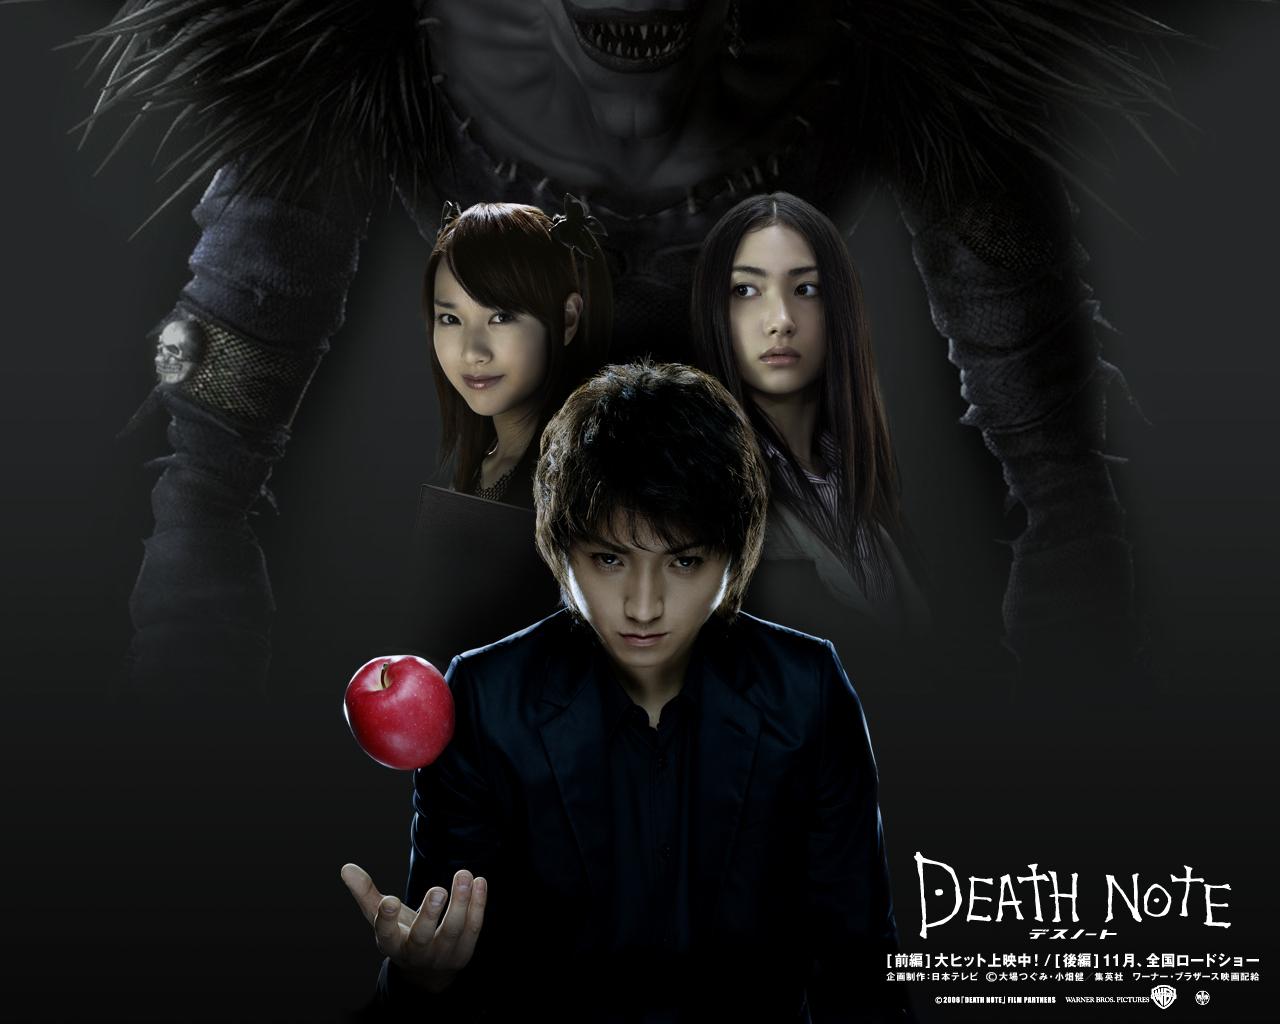 death note - Death Note The Movie Wallpaper (8978336) - Fanpop